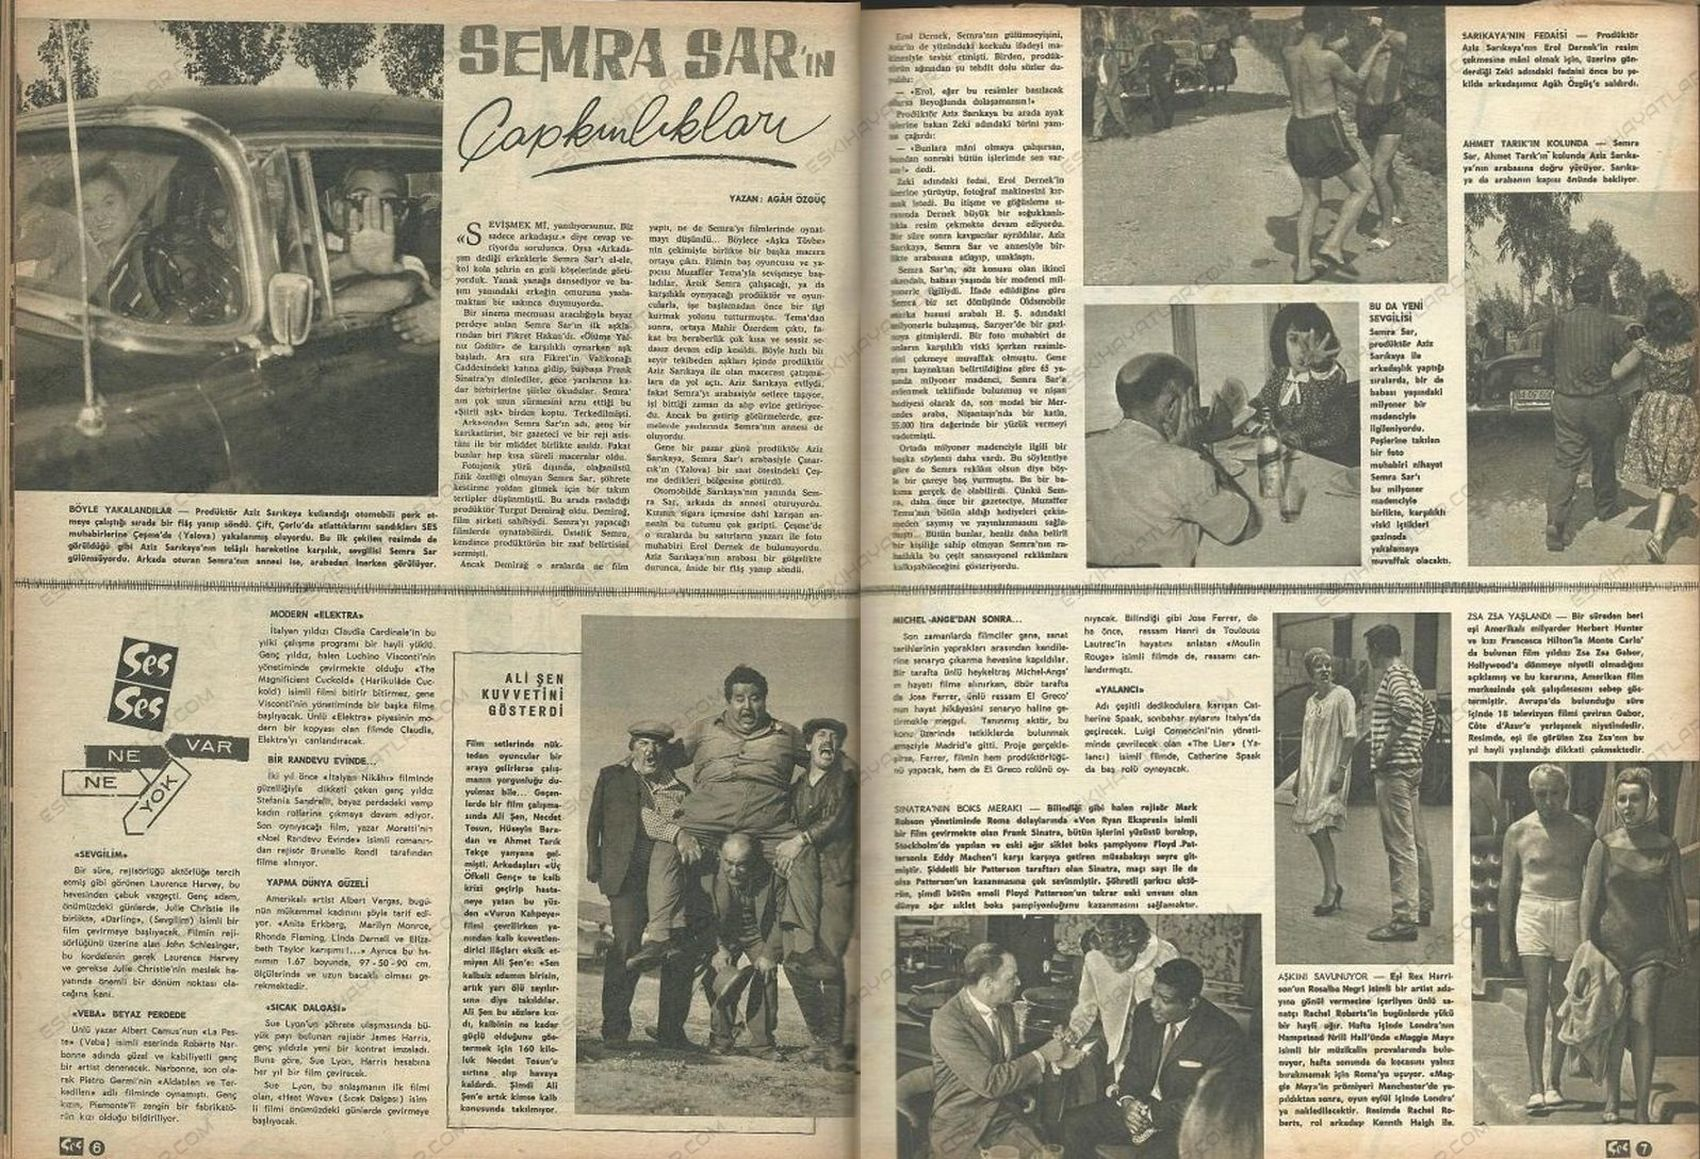 0371-semra-sar-kimdir-semra-sar-fotograflari-1964-ses-dergisi-arsivleri (00)